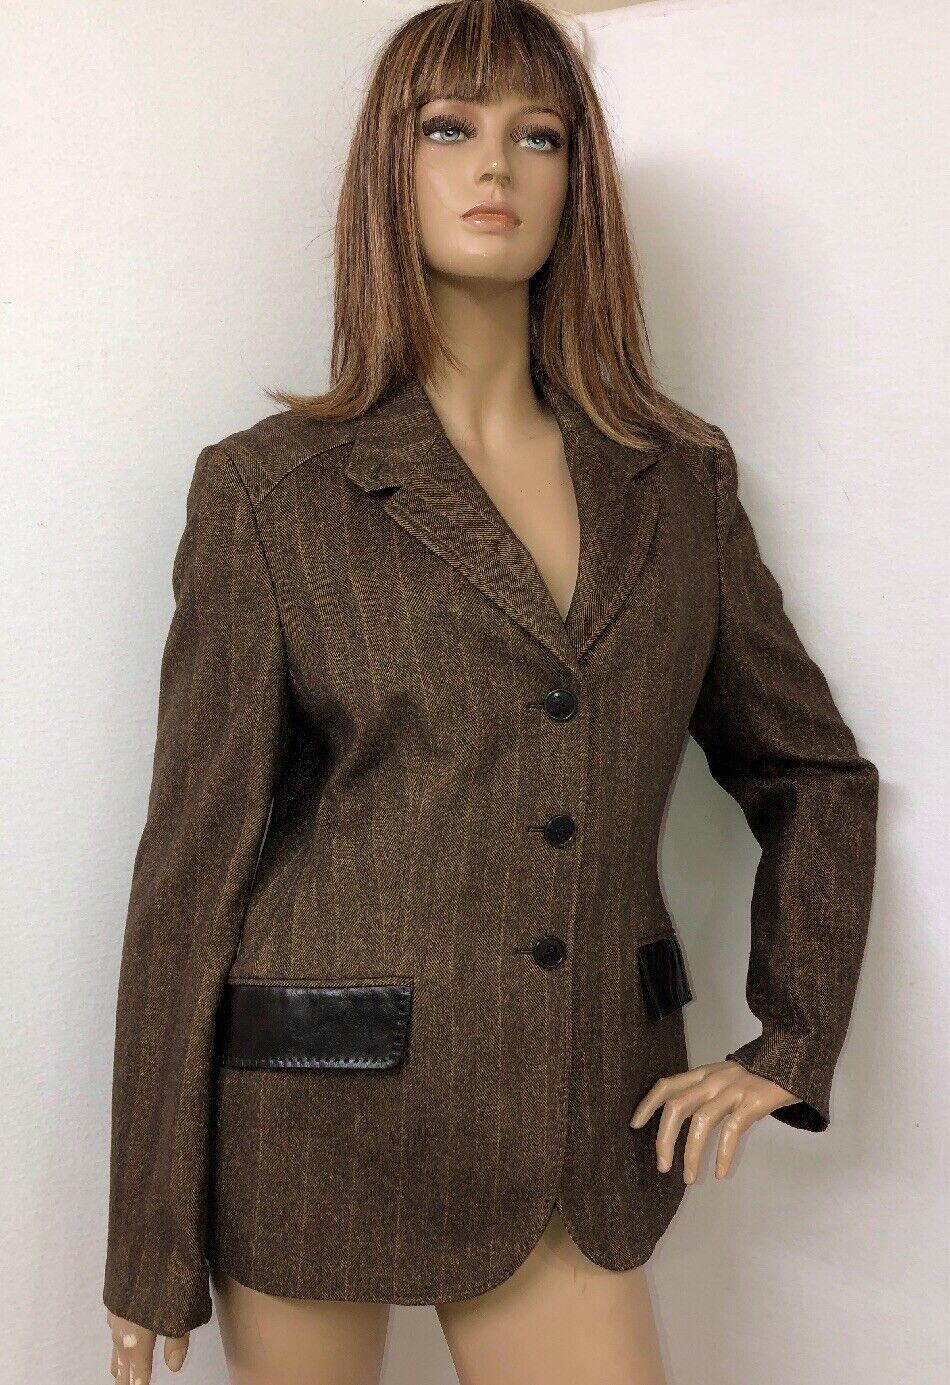 Lujo chaqueta blazer para mujer BRIONI  Seda Cachemira Talla 48 EE. UU. 12  comprar barato